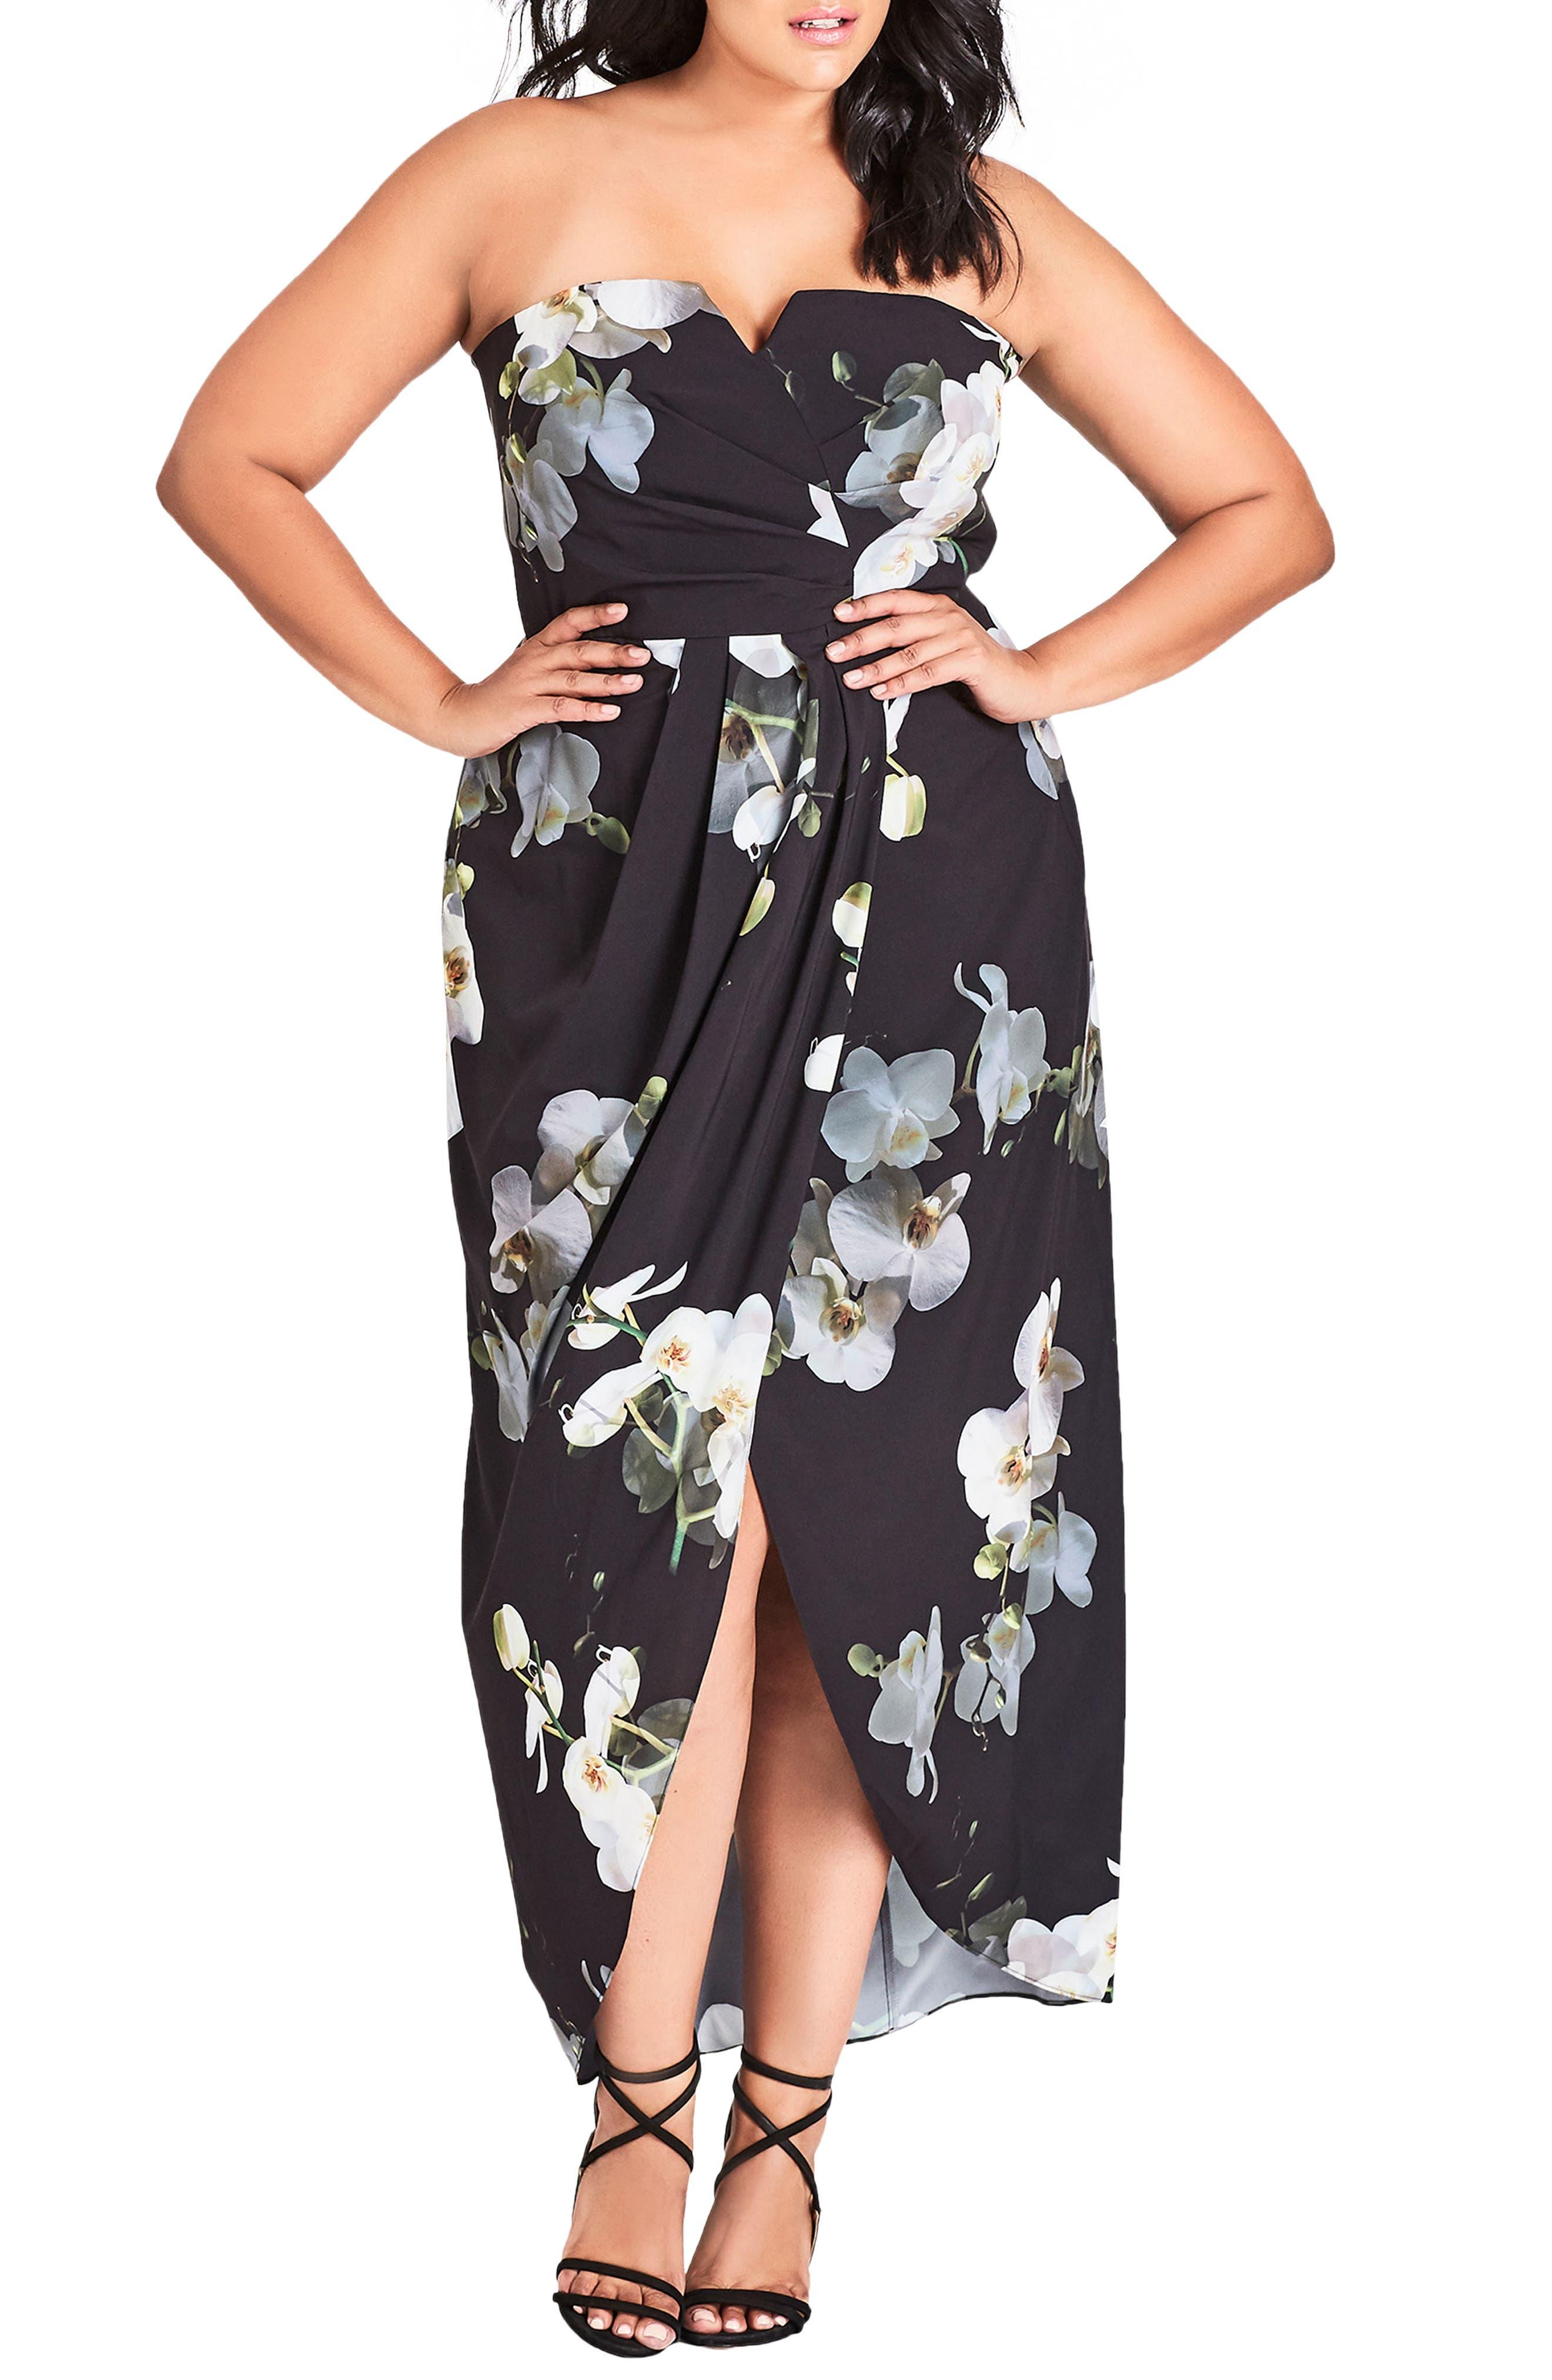 Orchid Dreams Strapless Maxi Dress,                             Main thumbnail 1, color,                             ORCHID DREAMS